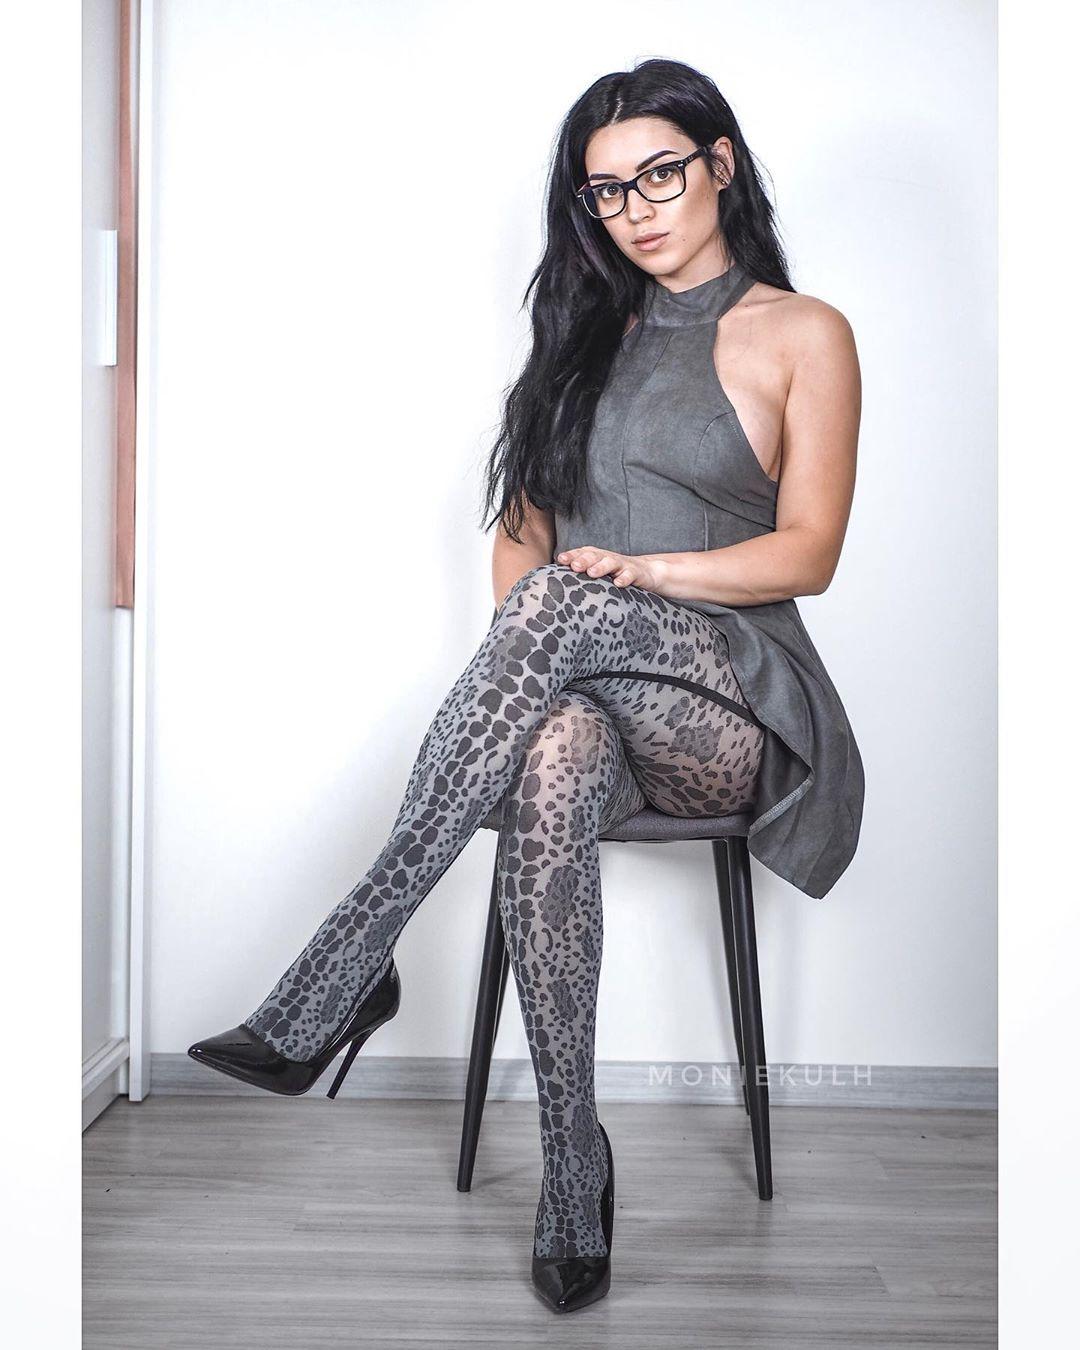 Monika Porn Pic - EPORNER